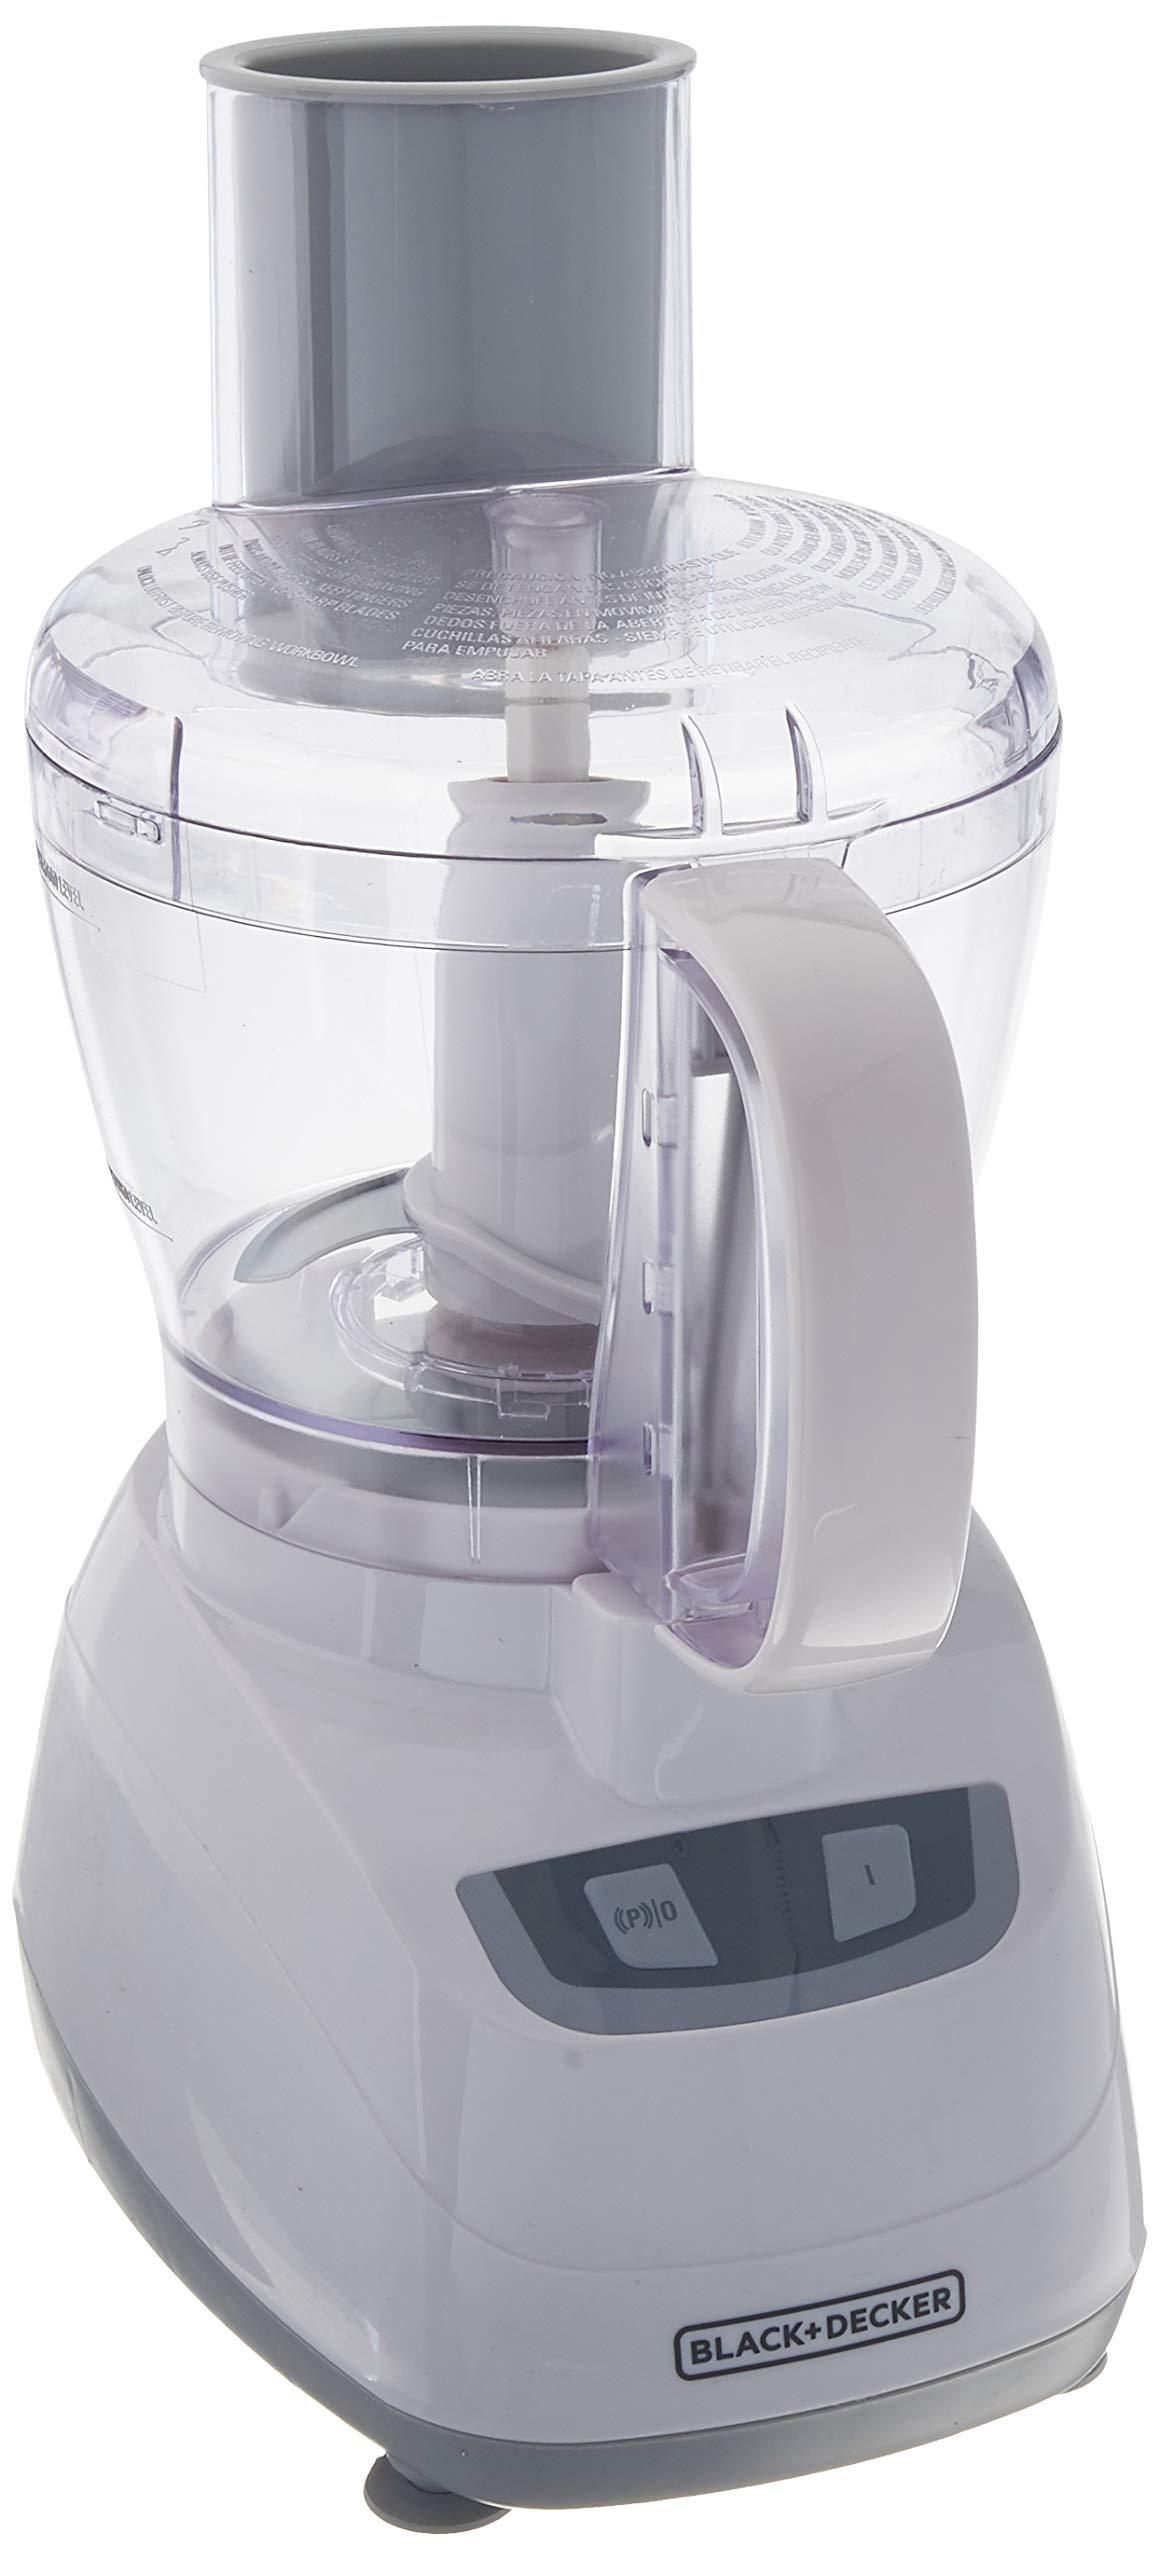 Black & Decker FP1700W Food Processor, White